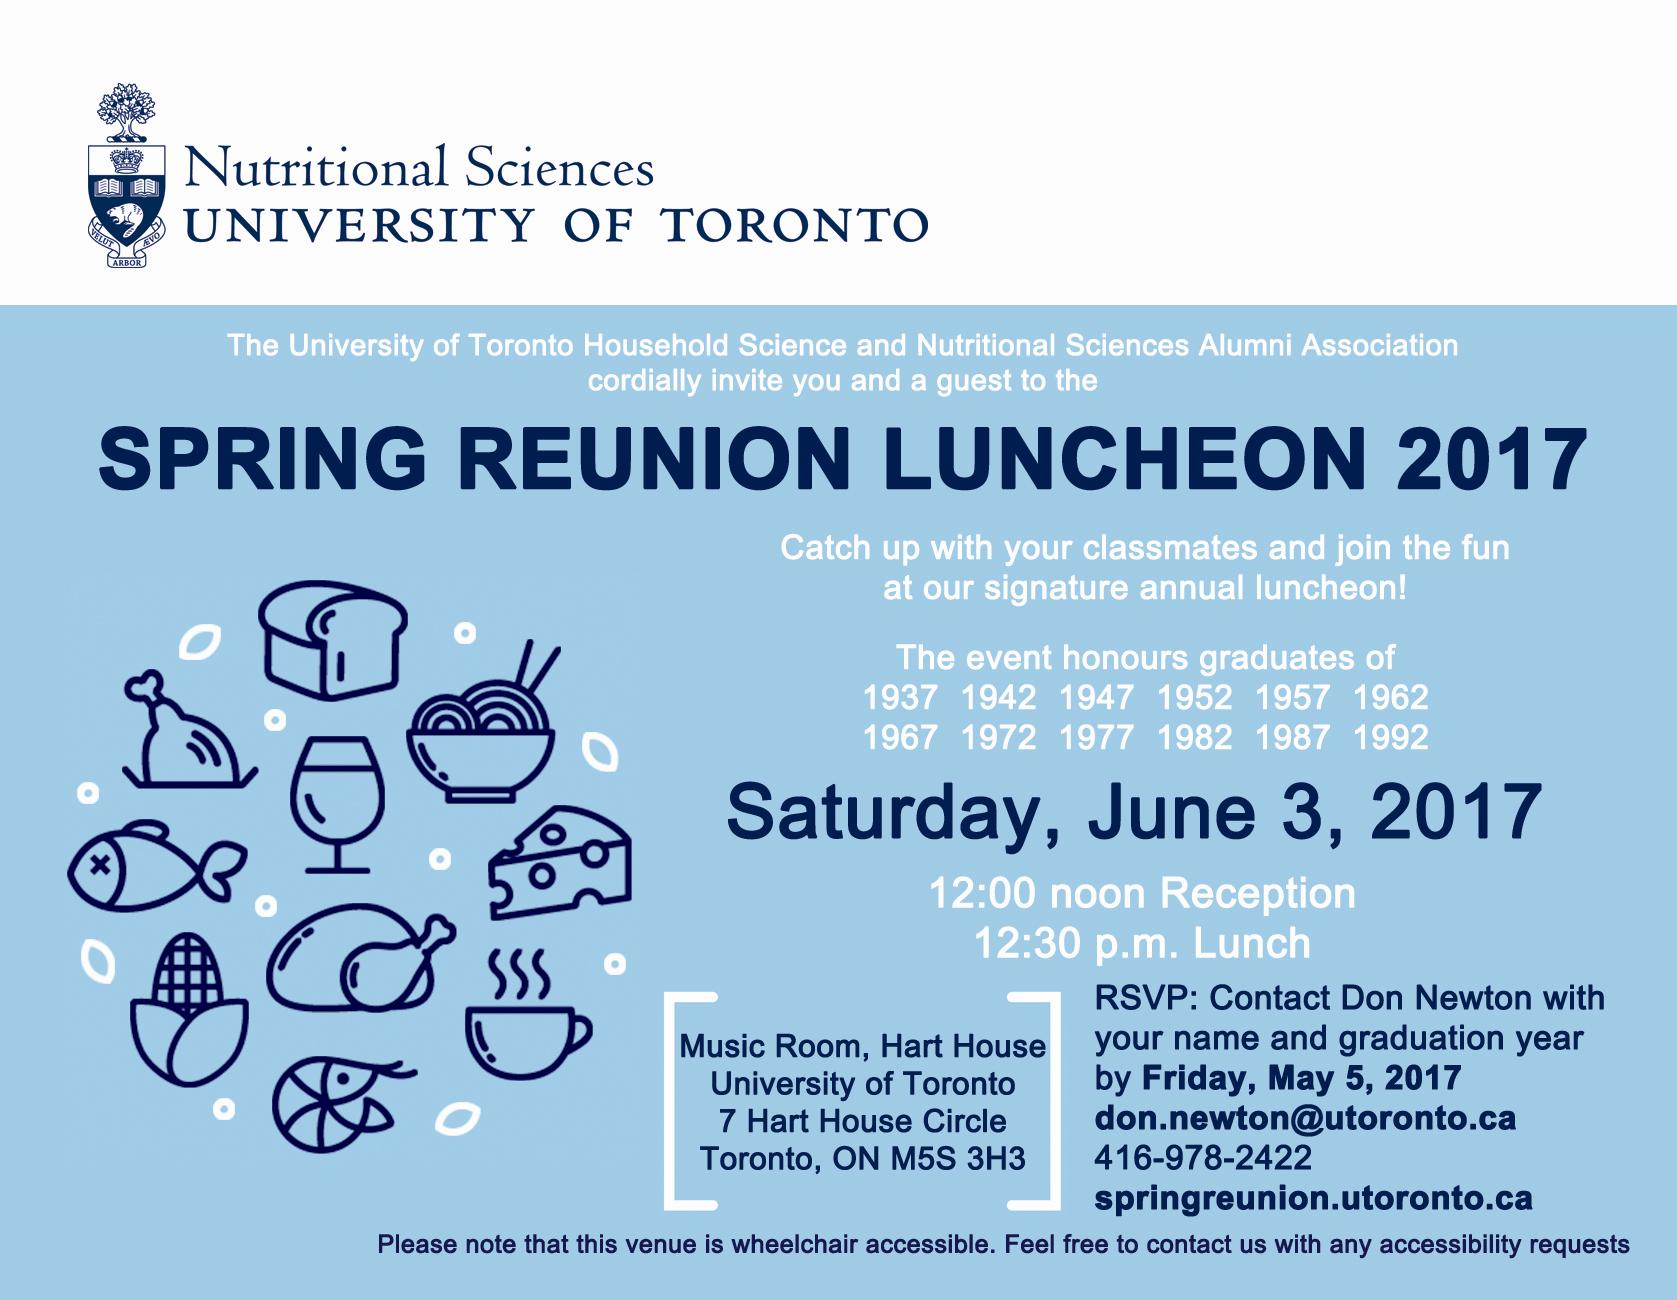 spring reunion luncheon invitation